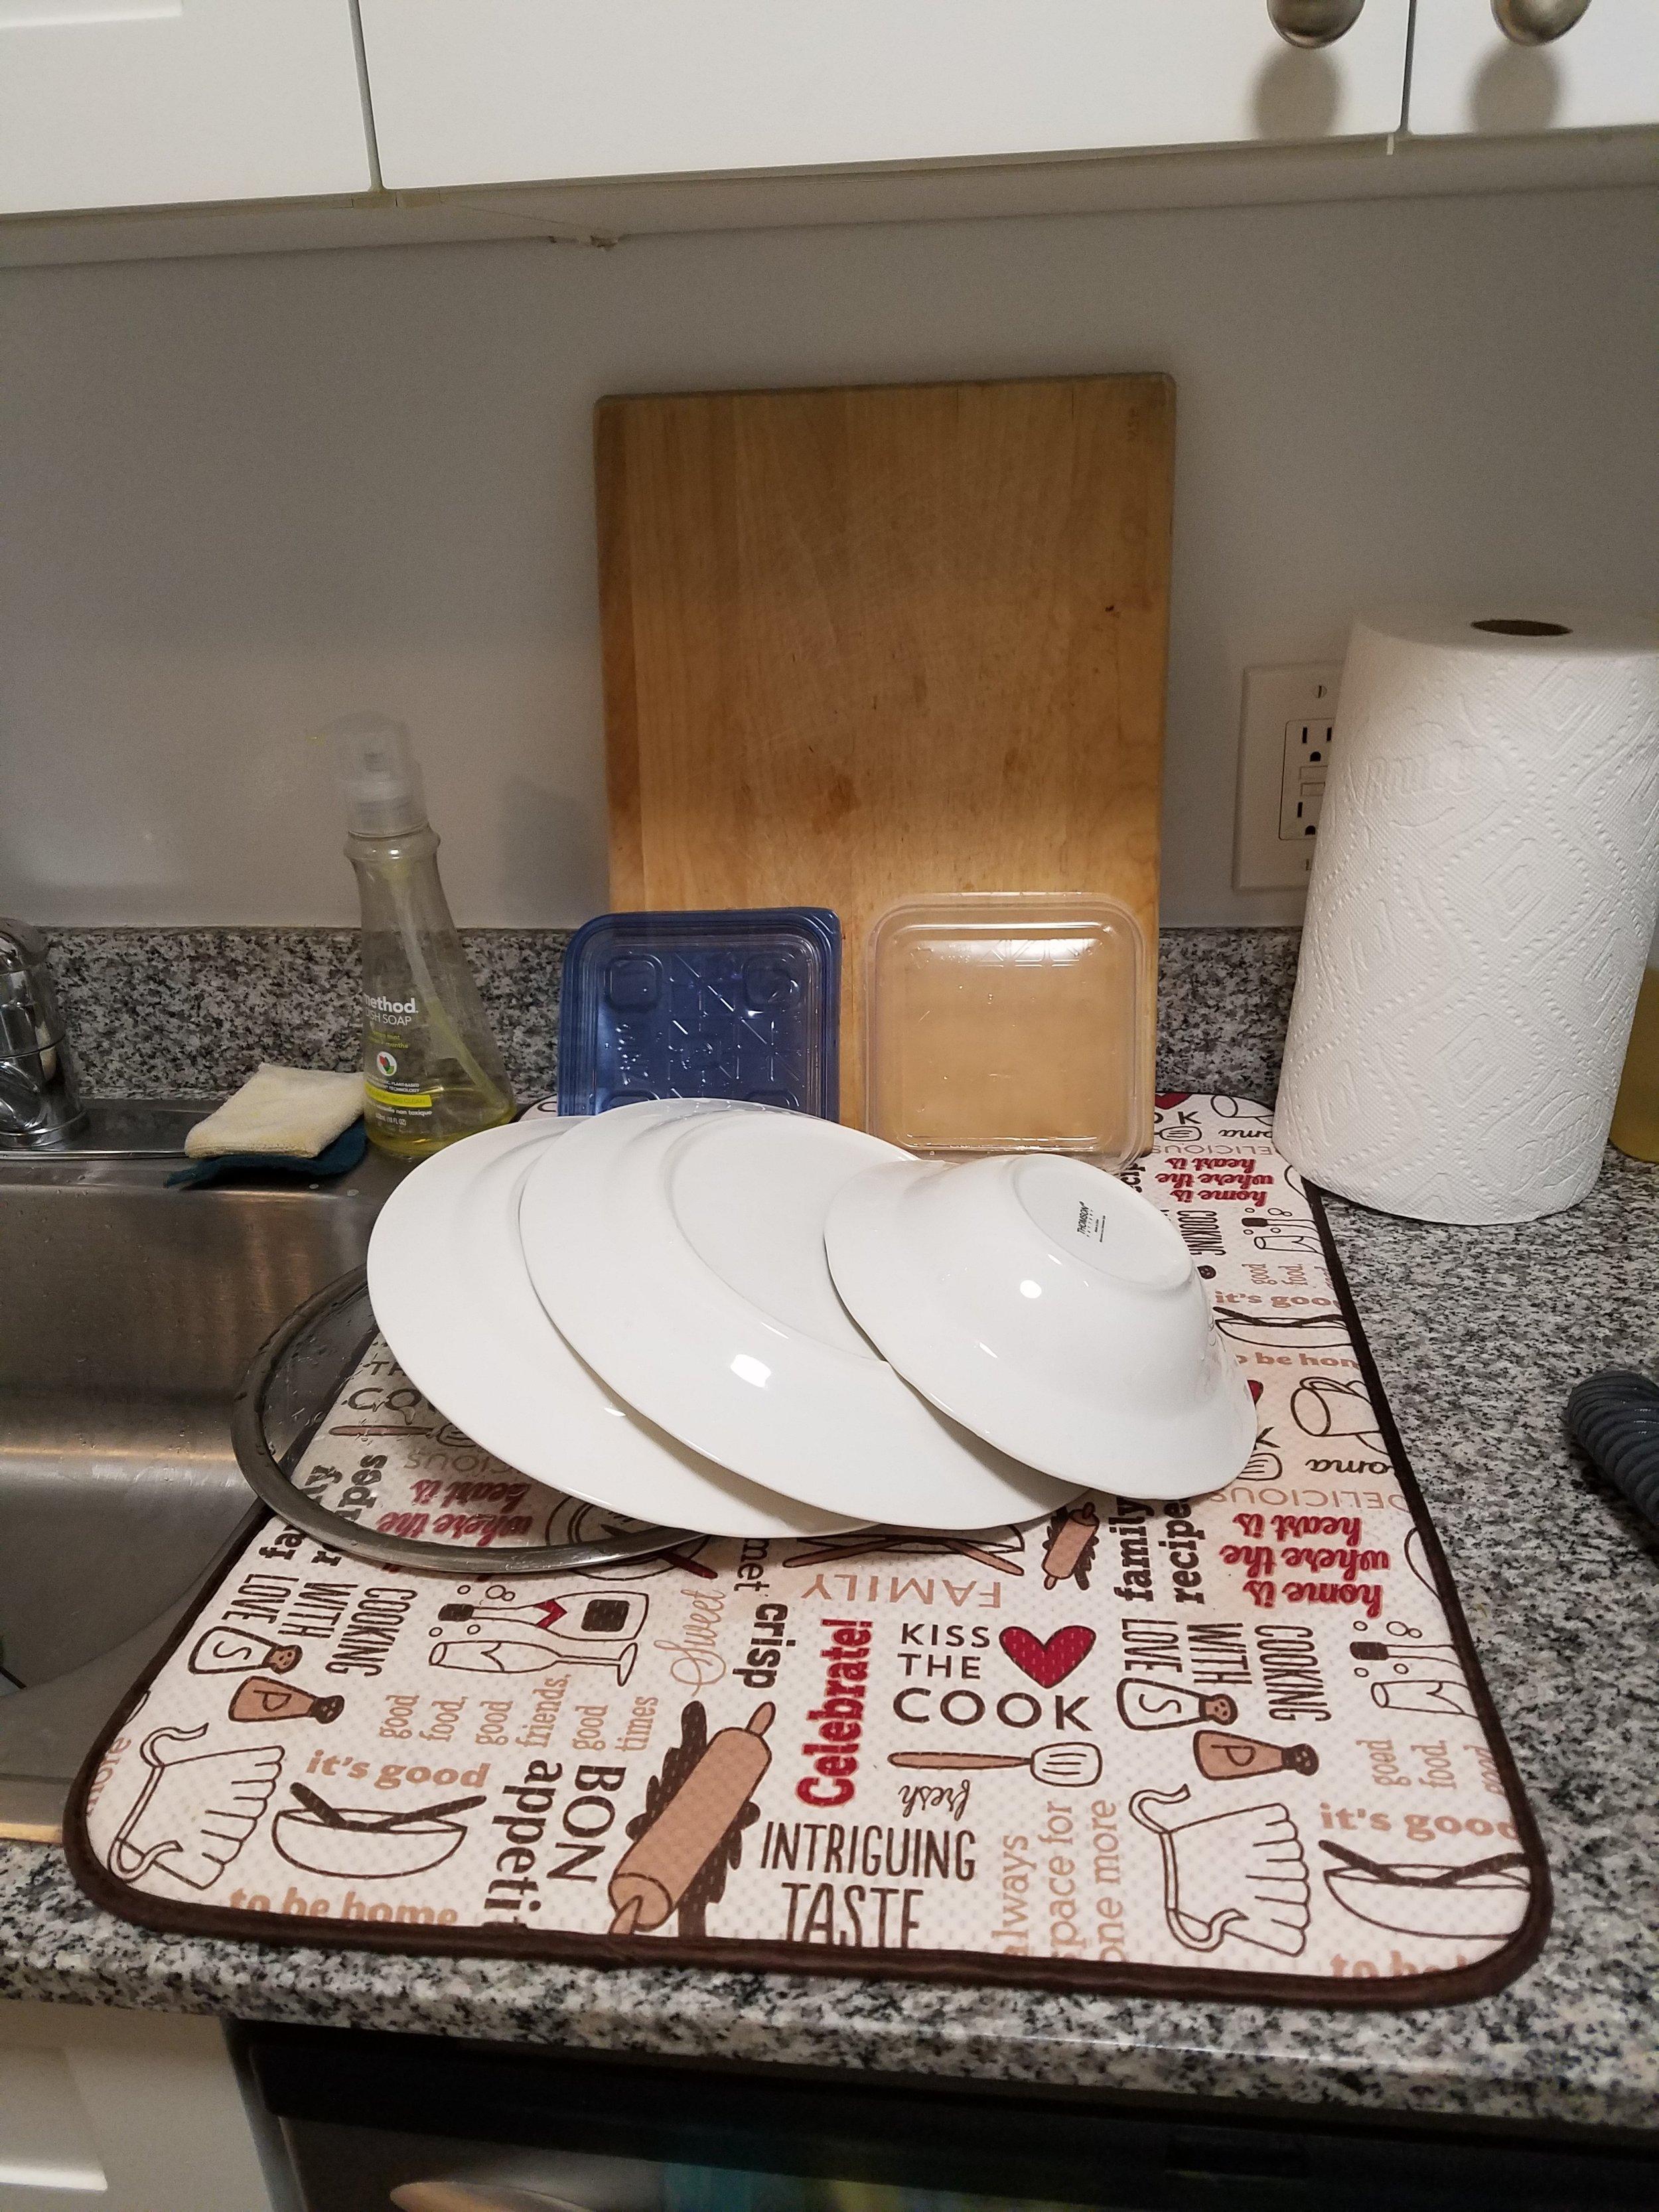 Chef'd Smoky Maple Pork Loin Wash Dishes 2.jpg